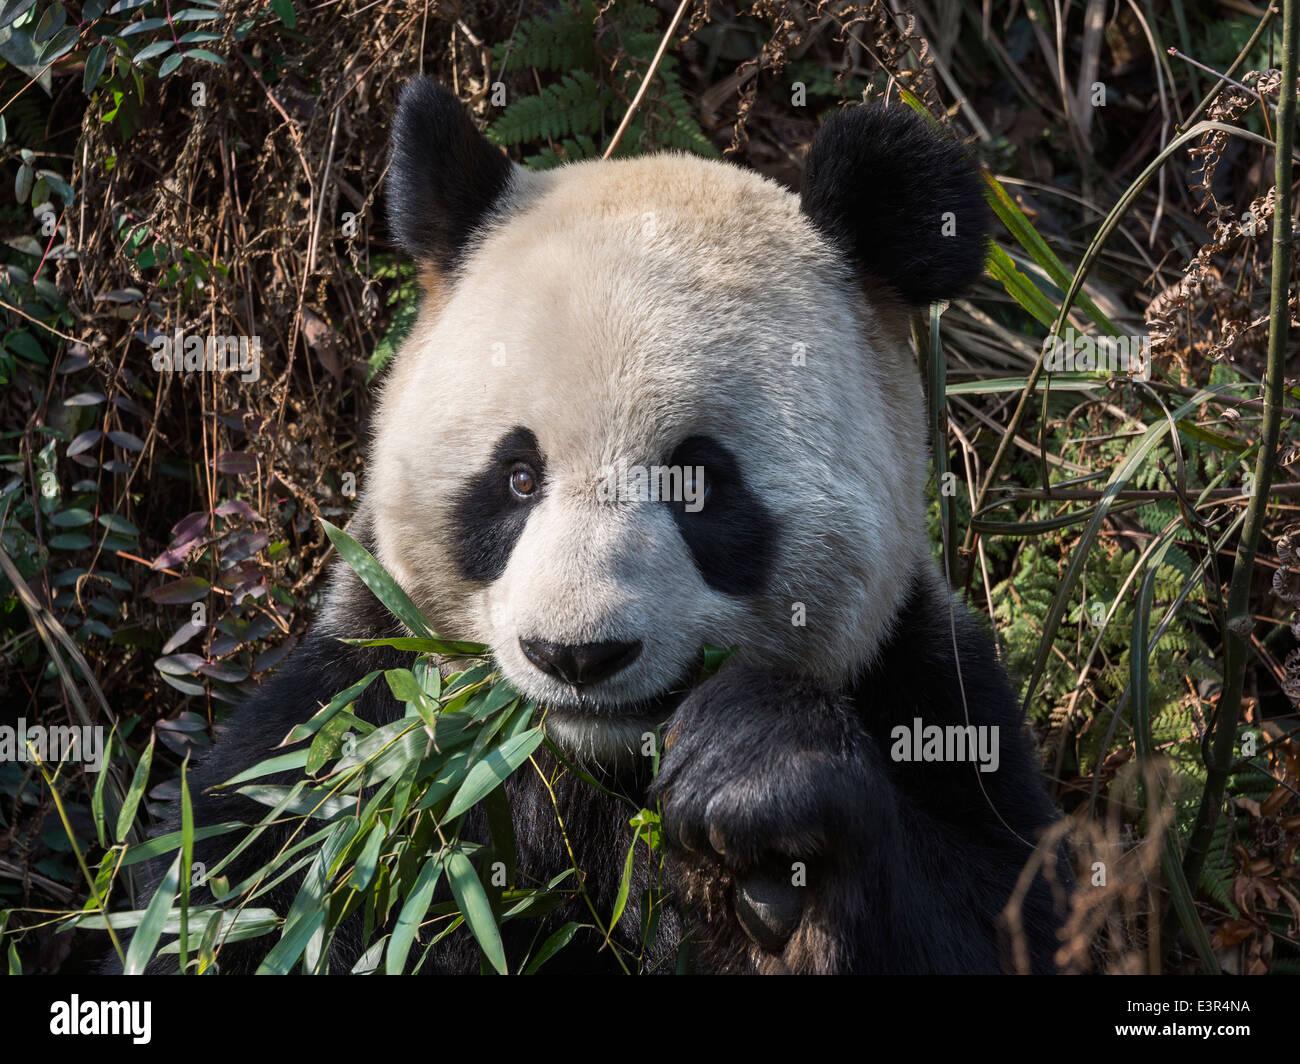 Giant Panda Nahaufnahme Essen Bambus Blatter Bifeng Xia Provinz